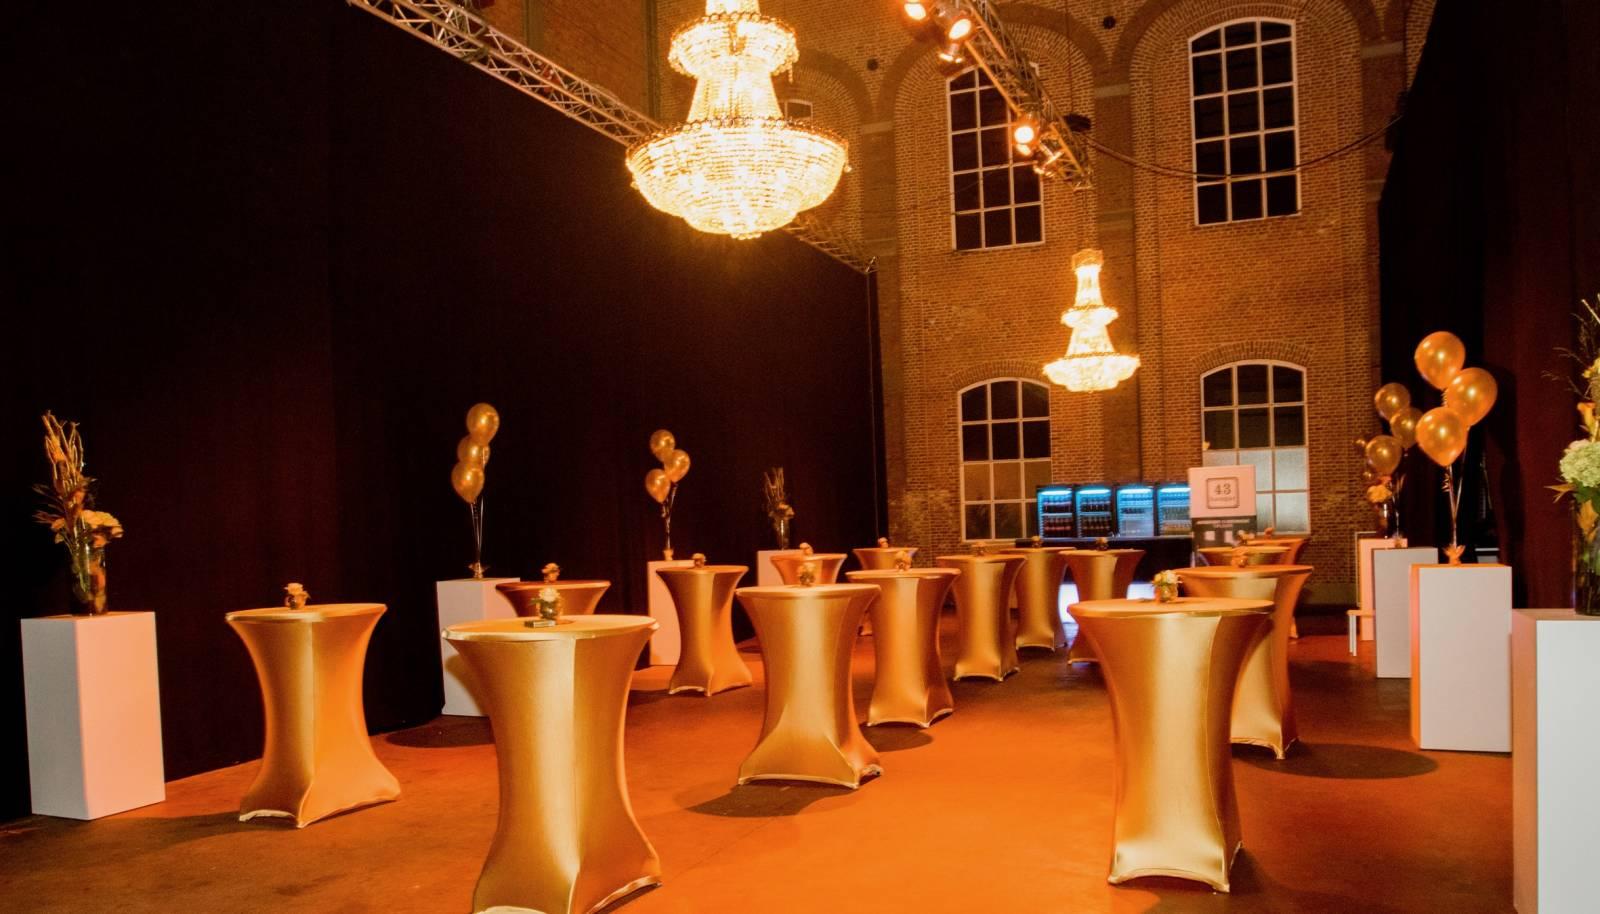 Hangar 43 - Feestzaal Oost-Vlaanderen - Industrieel - House of Weddings - 13